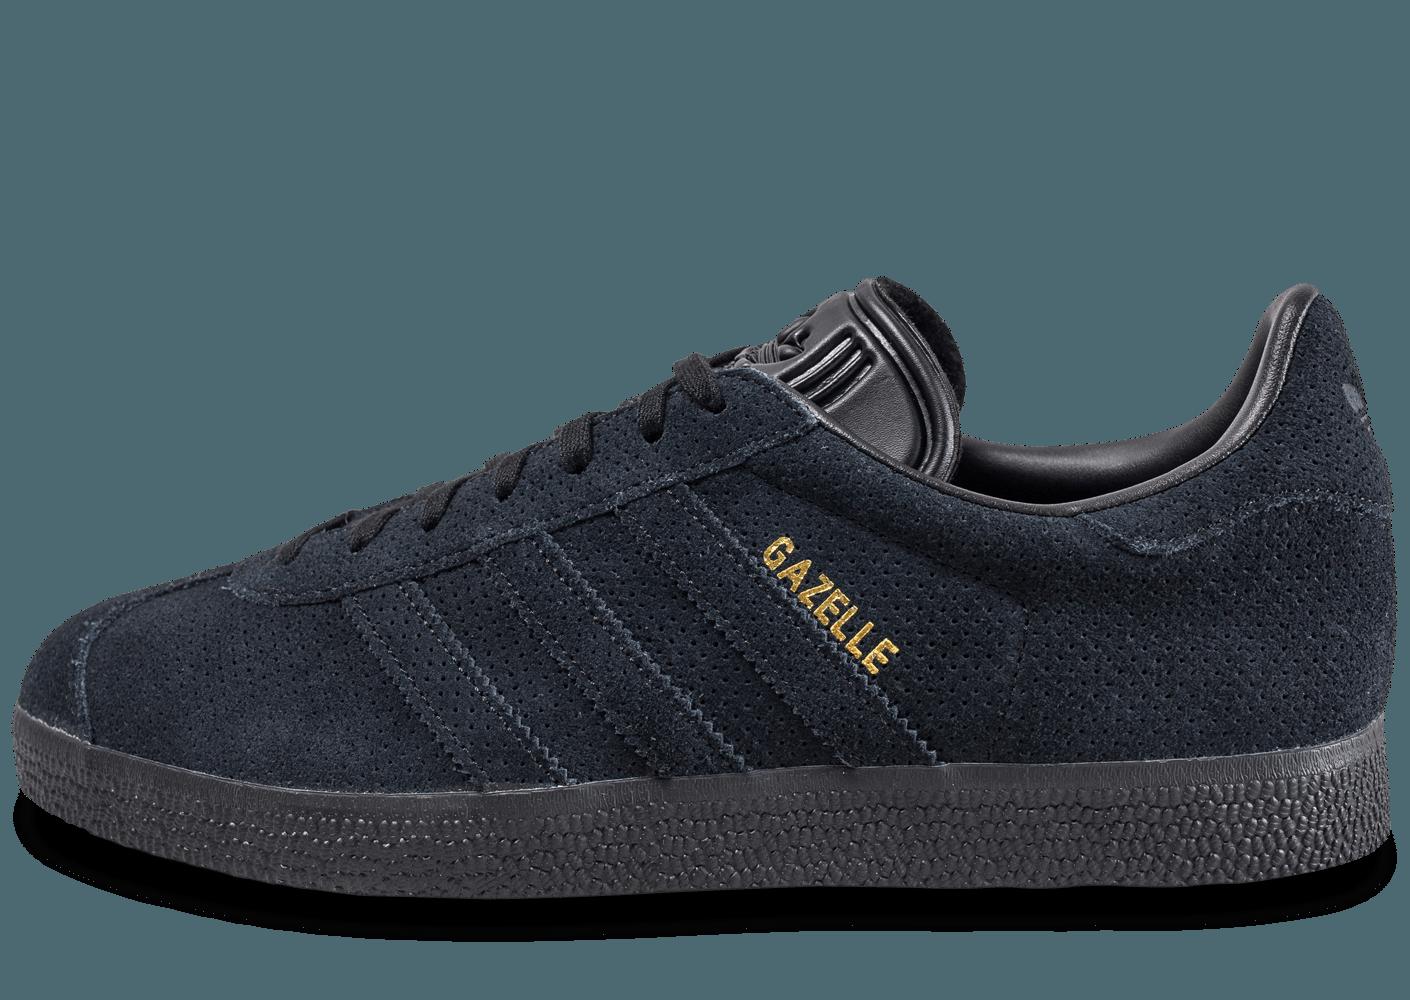 chaussure adidas noir et or